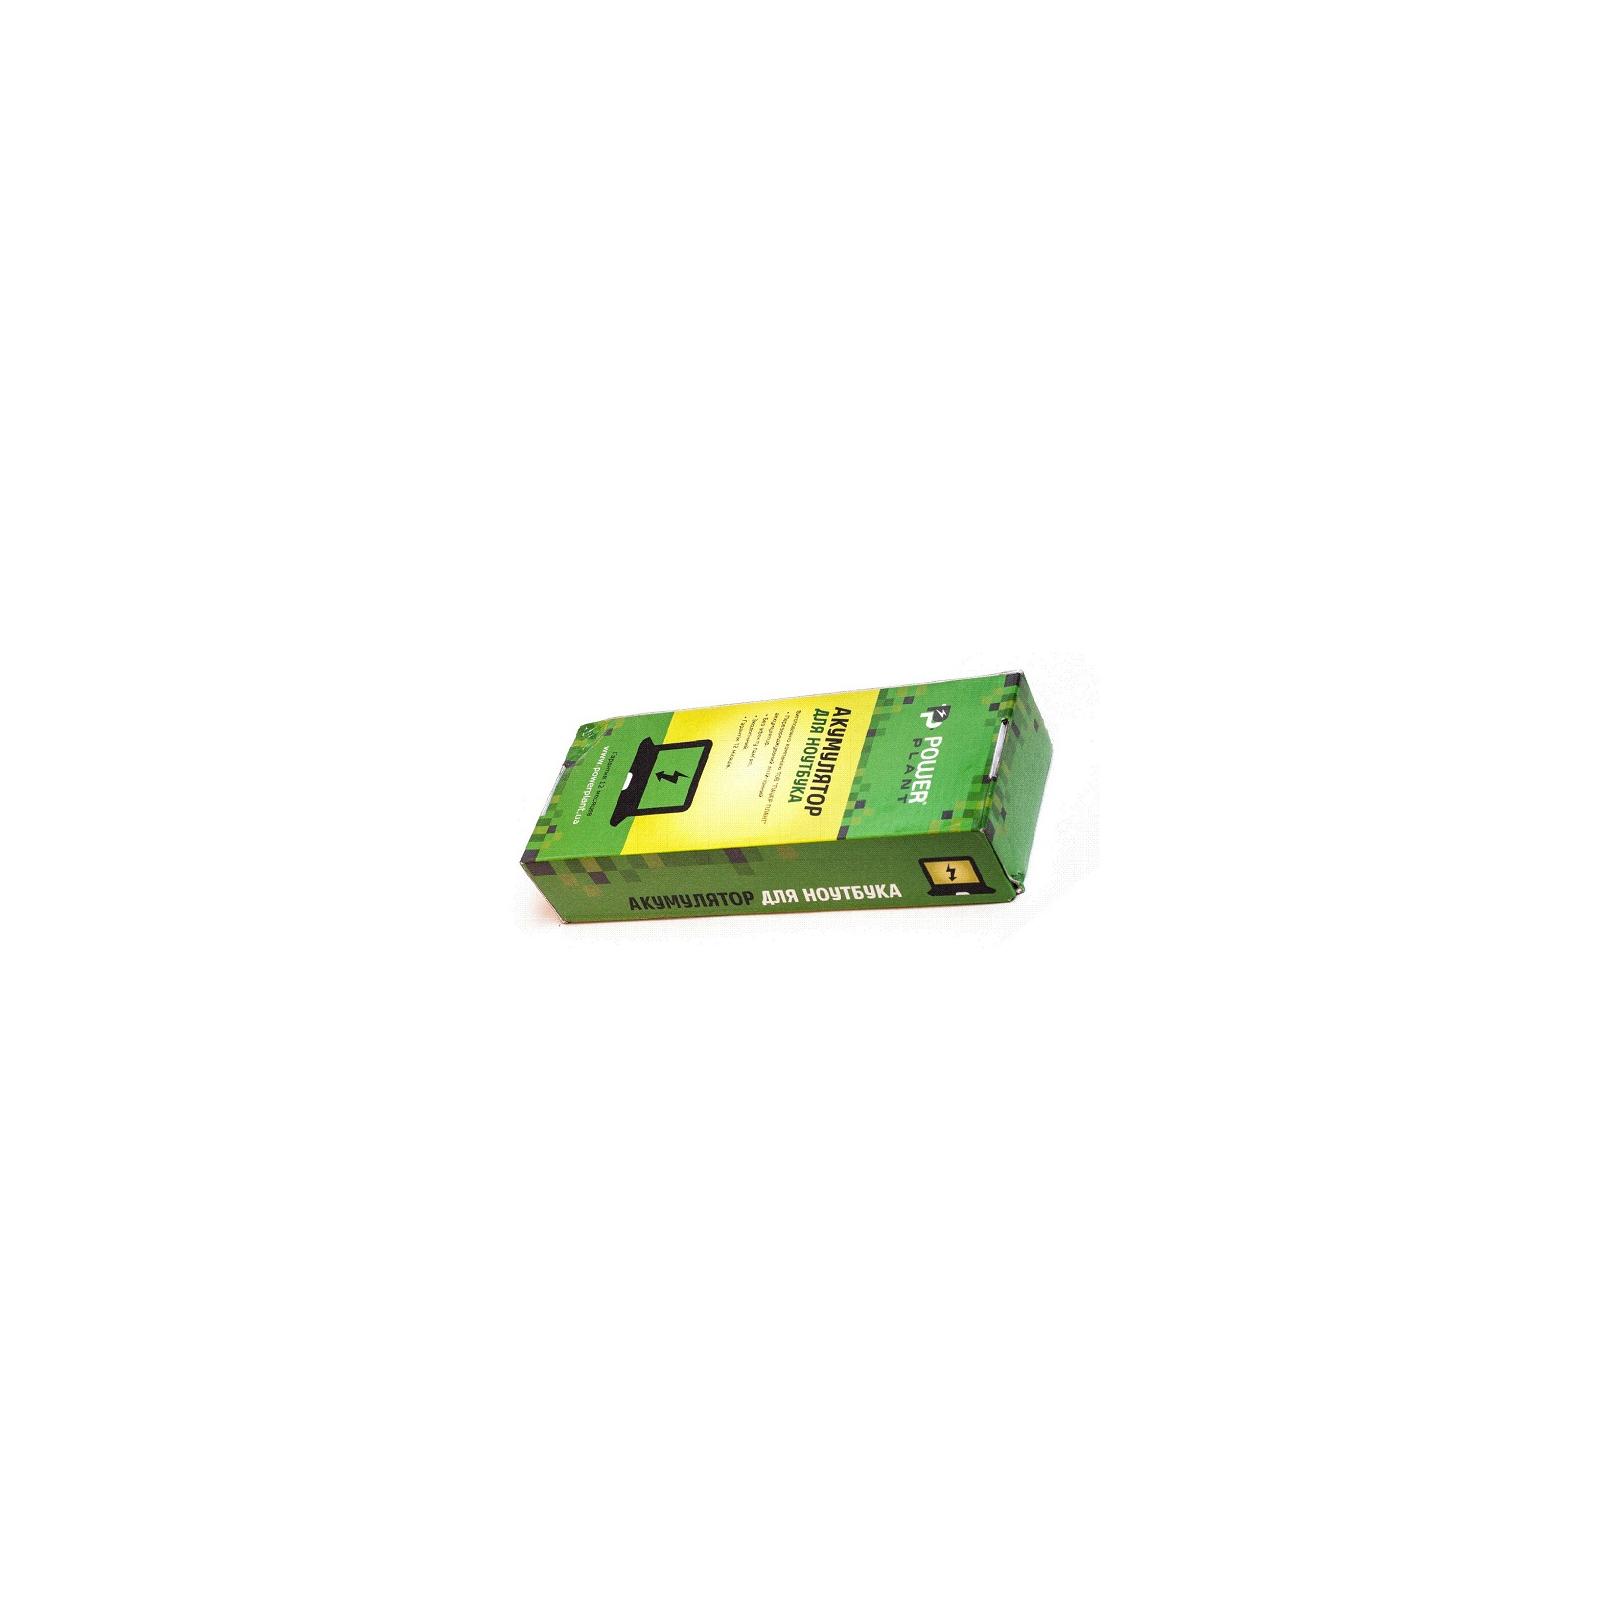 Аккумулятор для ноутбука ASUS Eee PC 1004DN (A31-U1 AS-U1F-6) 10,8V 4400mAh PowerPlant (NB00000173) изображение 3